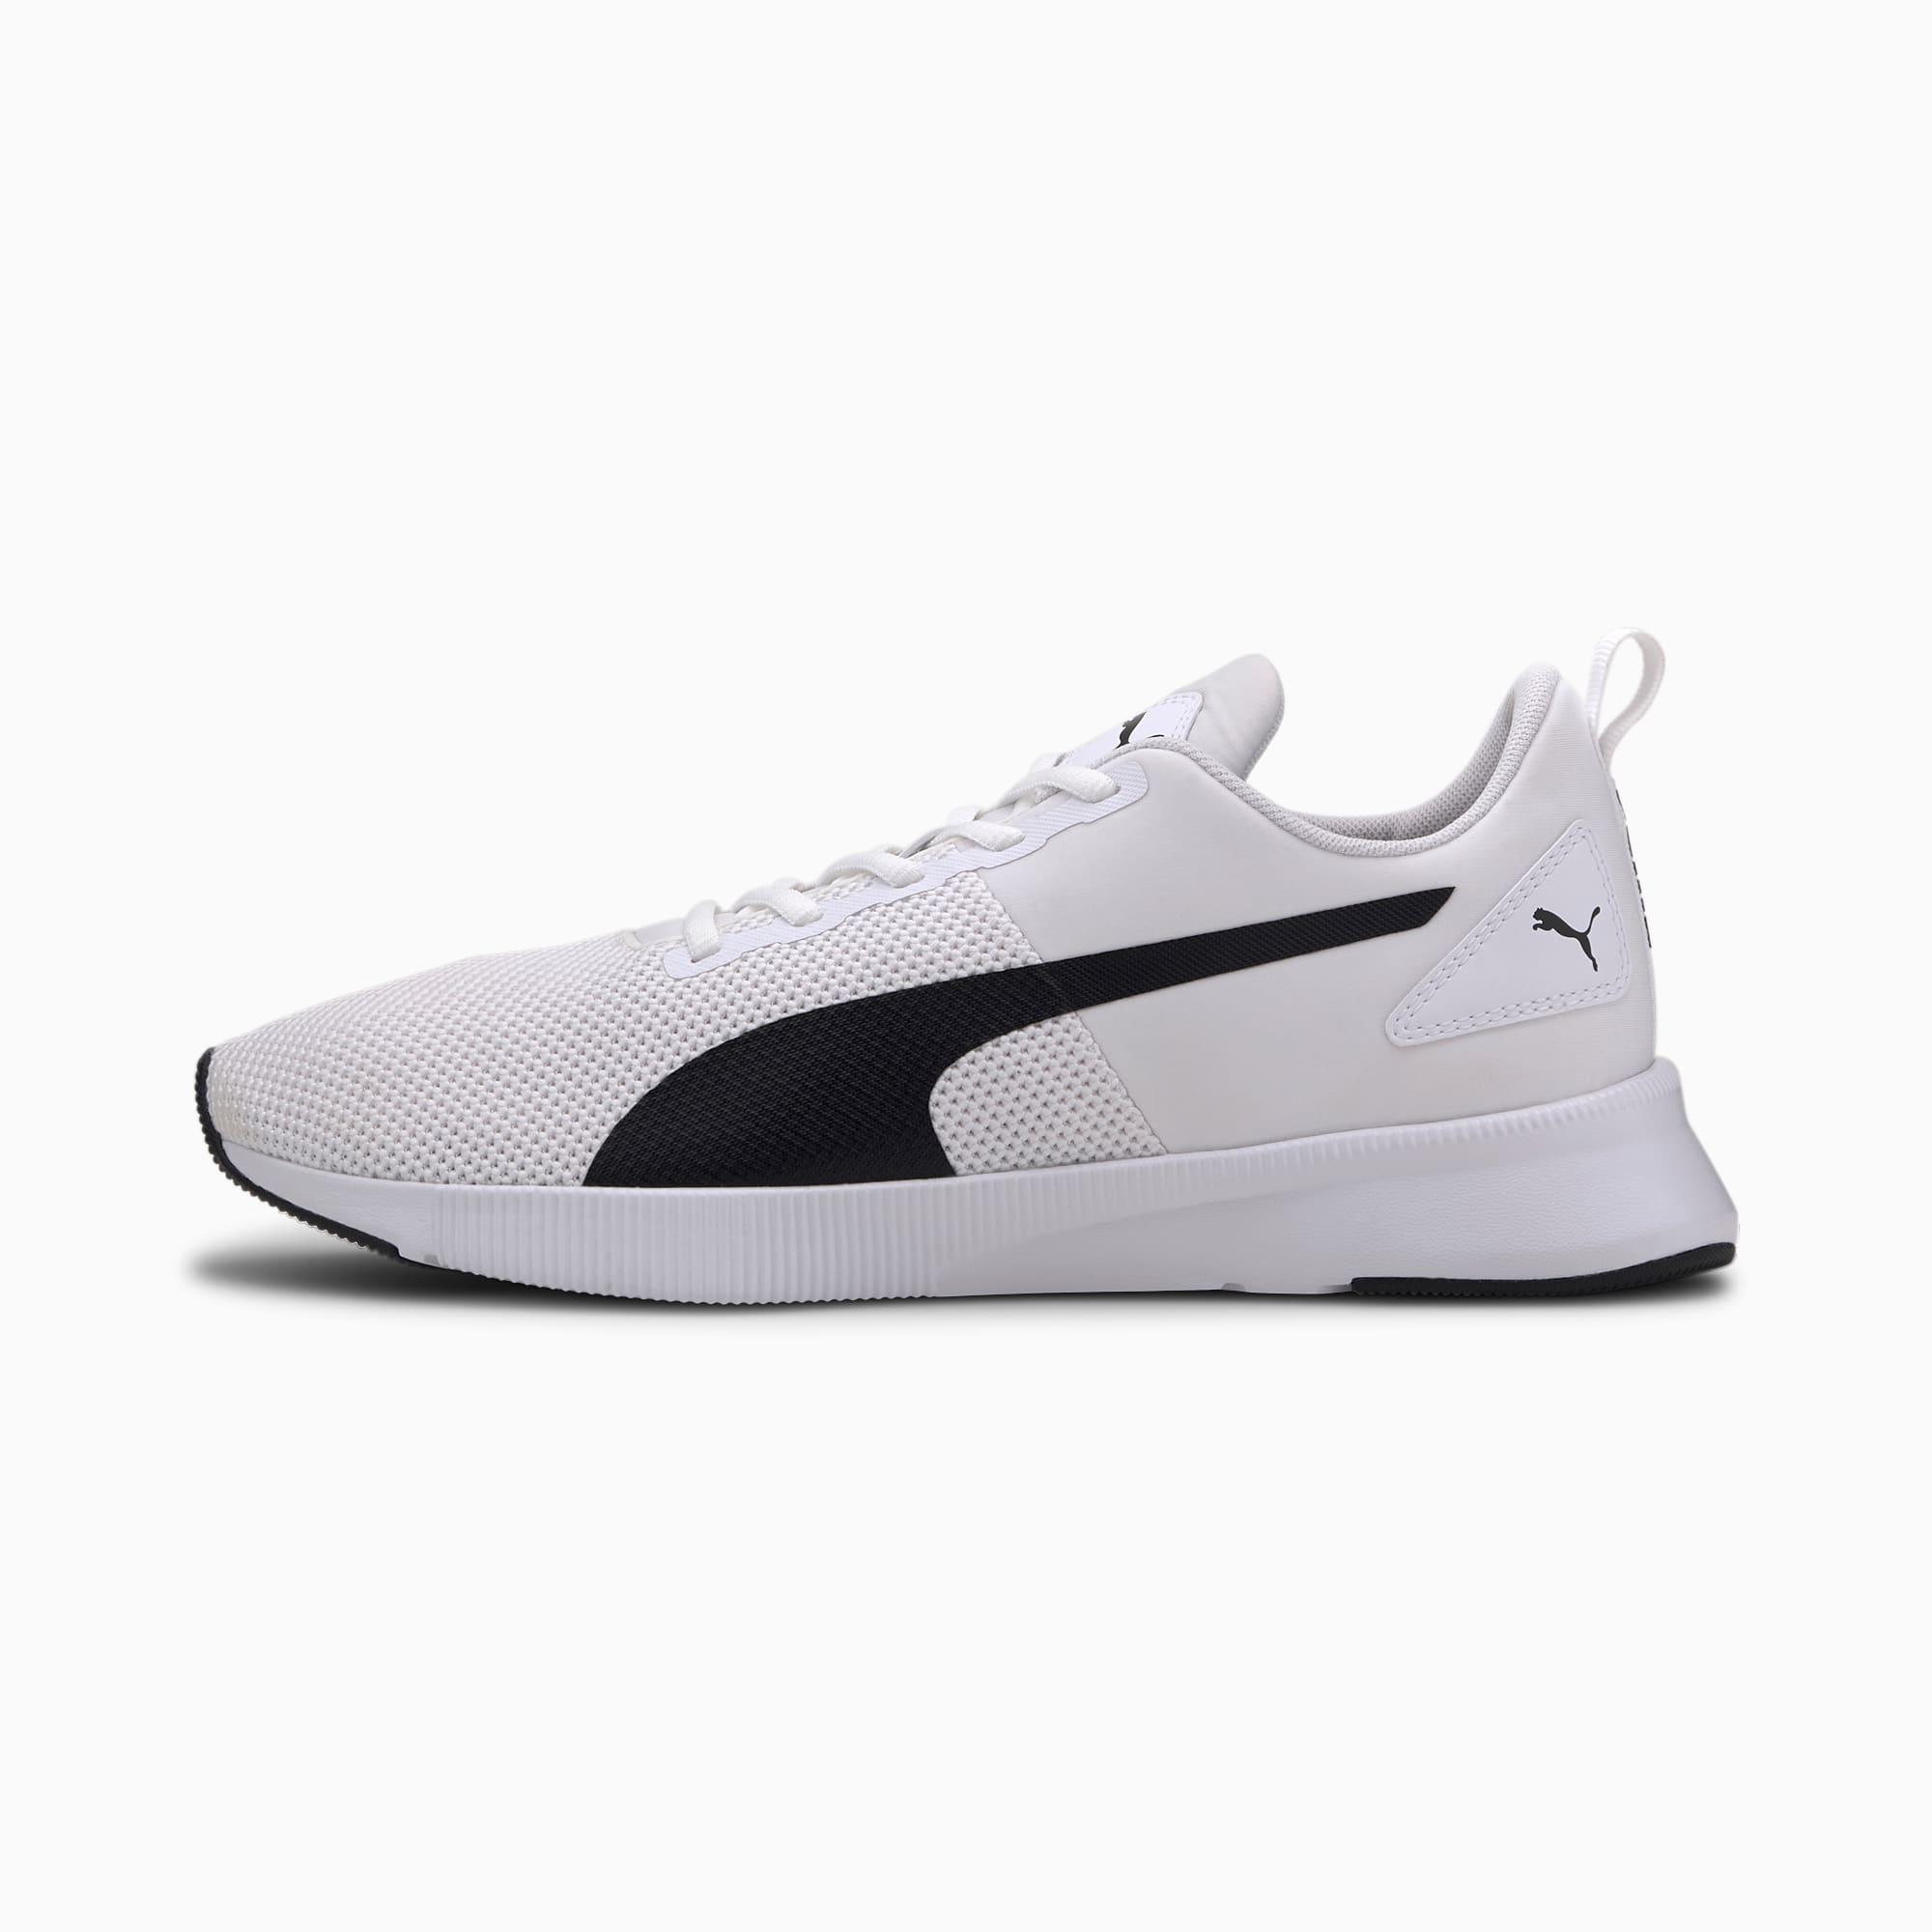 PUMA Chaussure de course Flyer Runner, Blanc/Noir, Taille 40.5, Chaussures